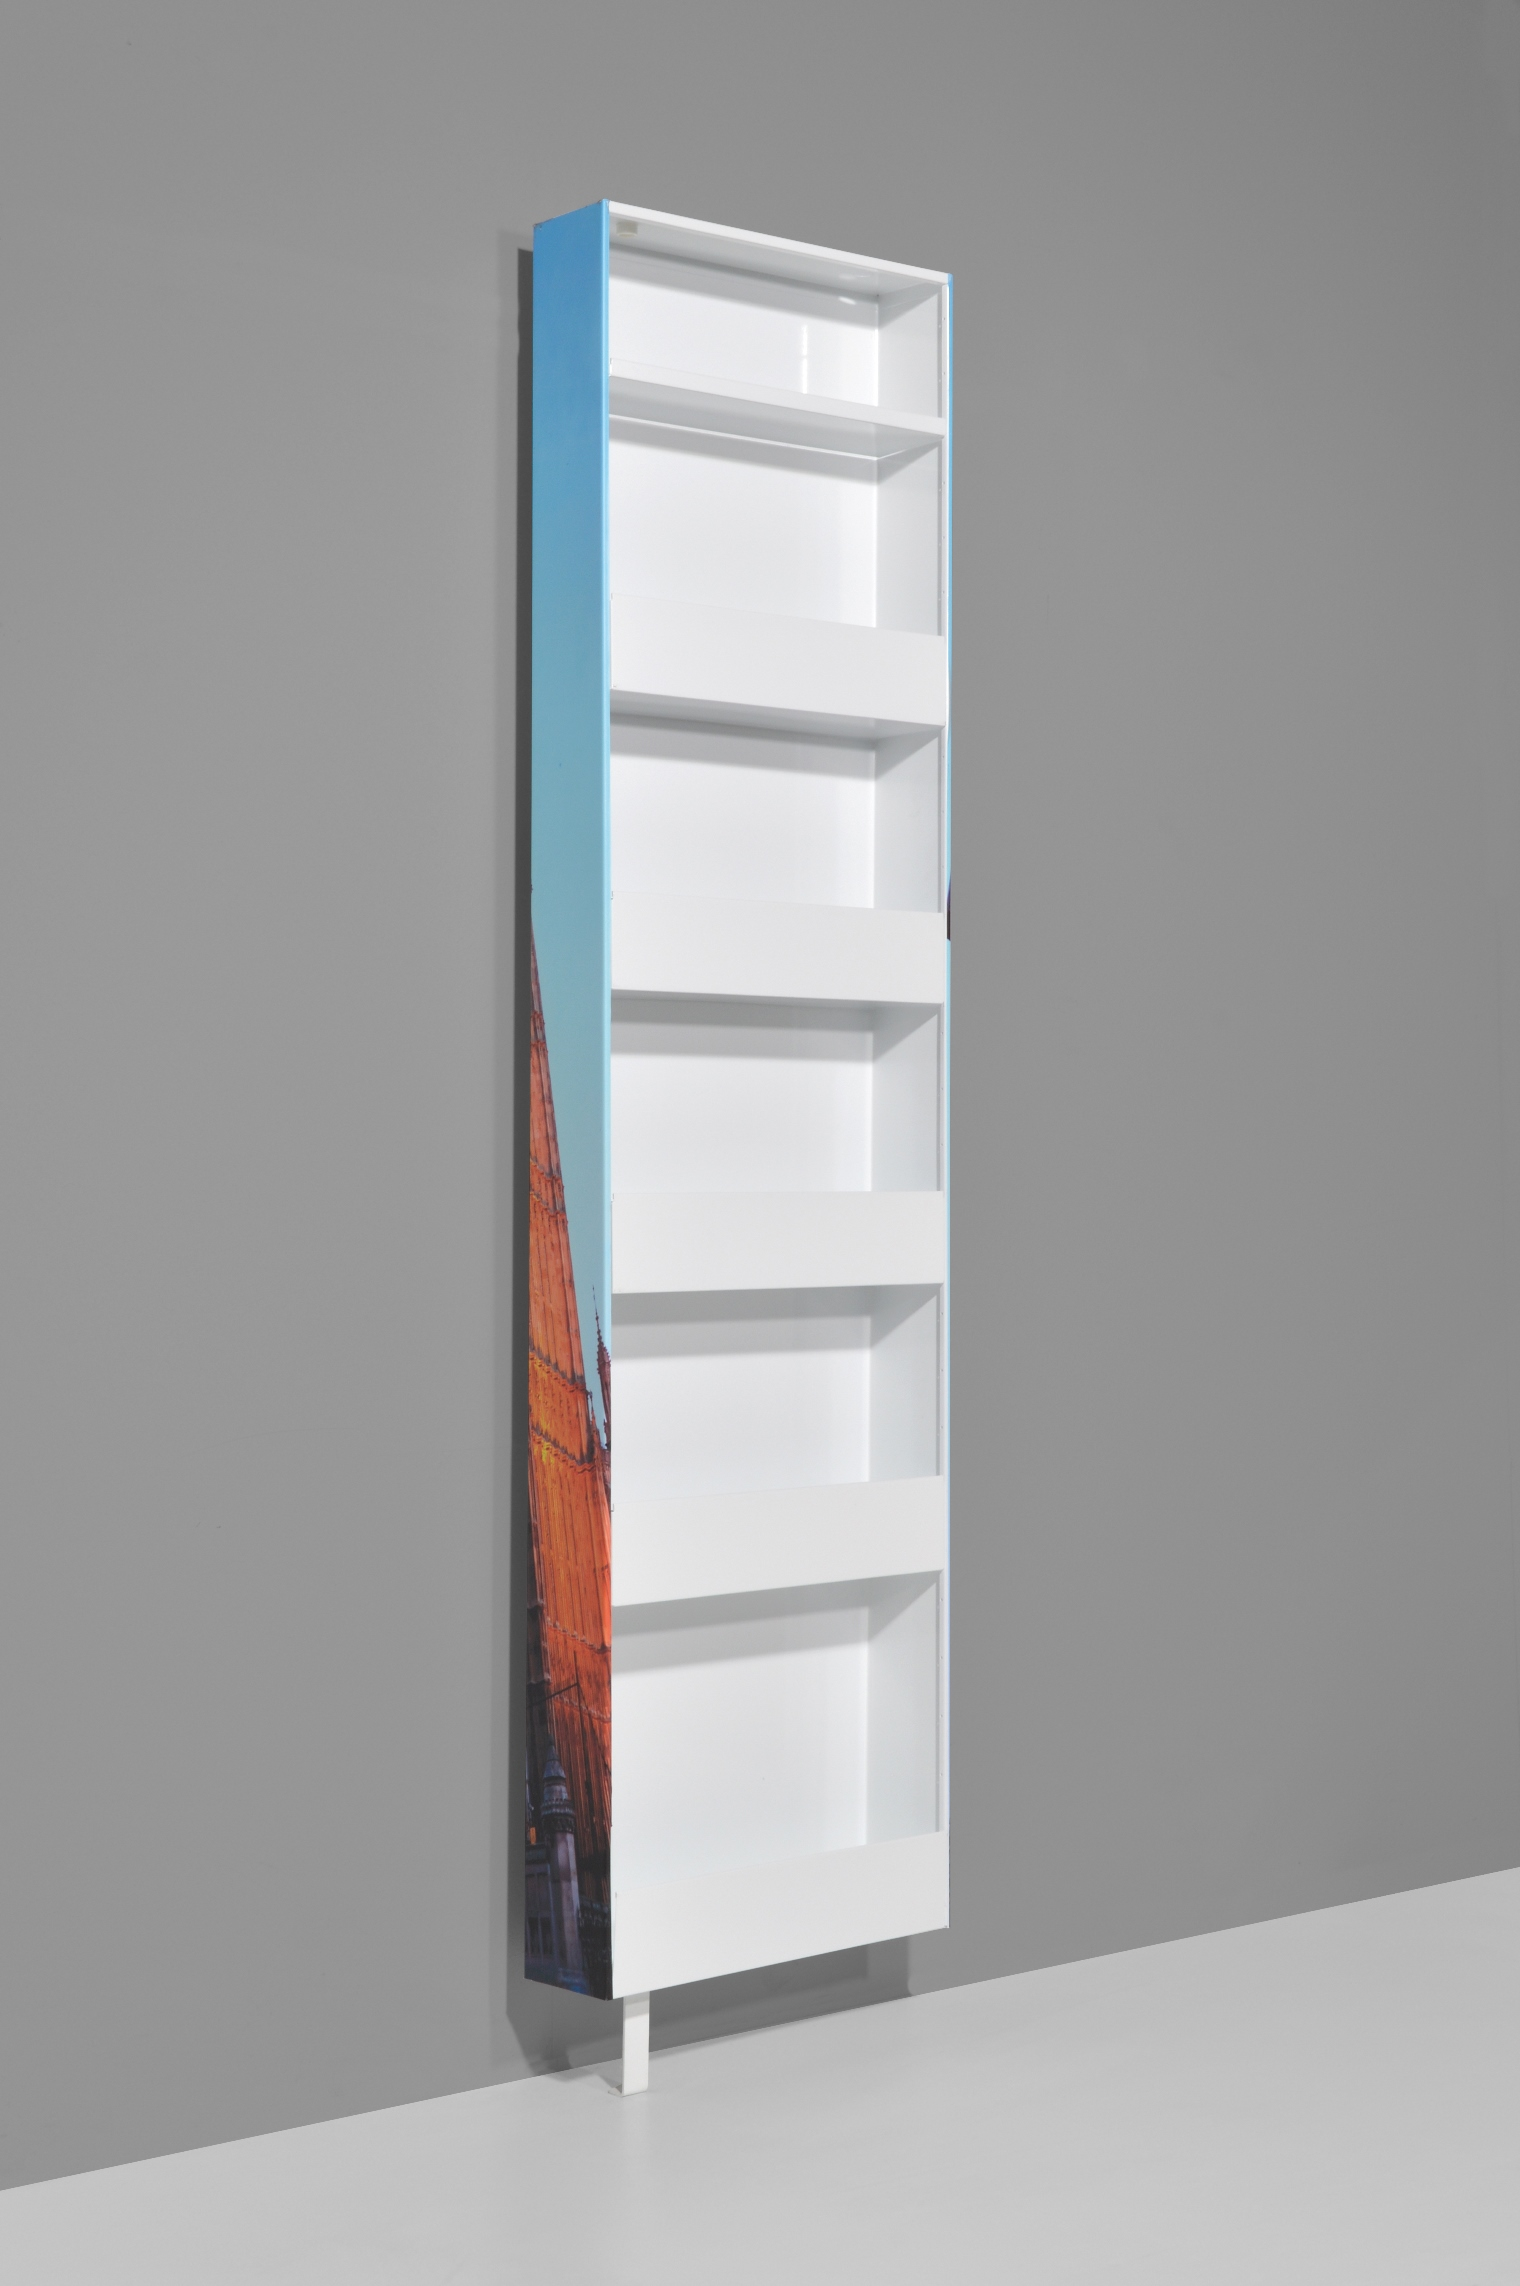 drehbarer schuhschrank mehrzweckschrank schrank mod gm610. Black Bedroom Furniture Sets. Home Design Ideas